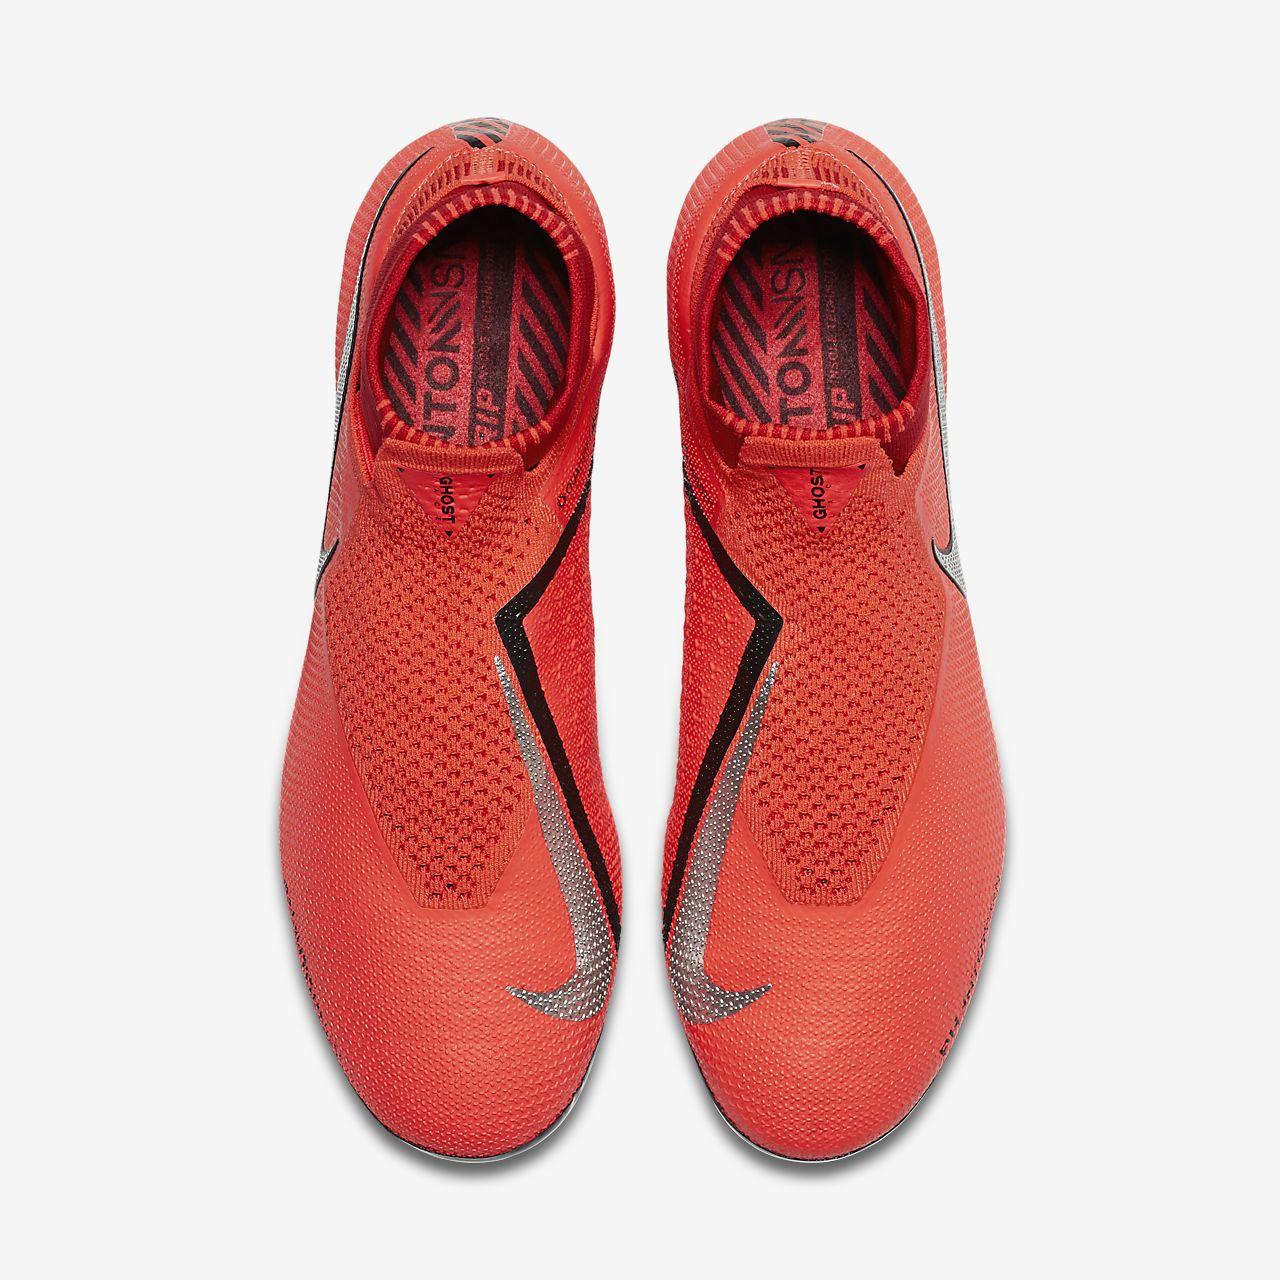 ... Calzado de fútbol para pasto artificial Nike Phantom Vision Elite  Dynamic Fit bbdd1e2023977